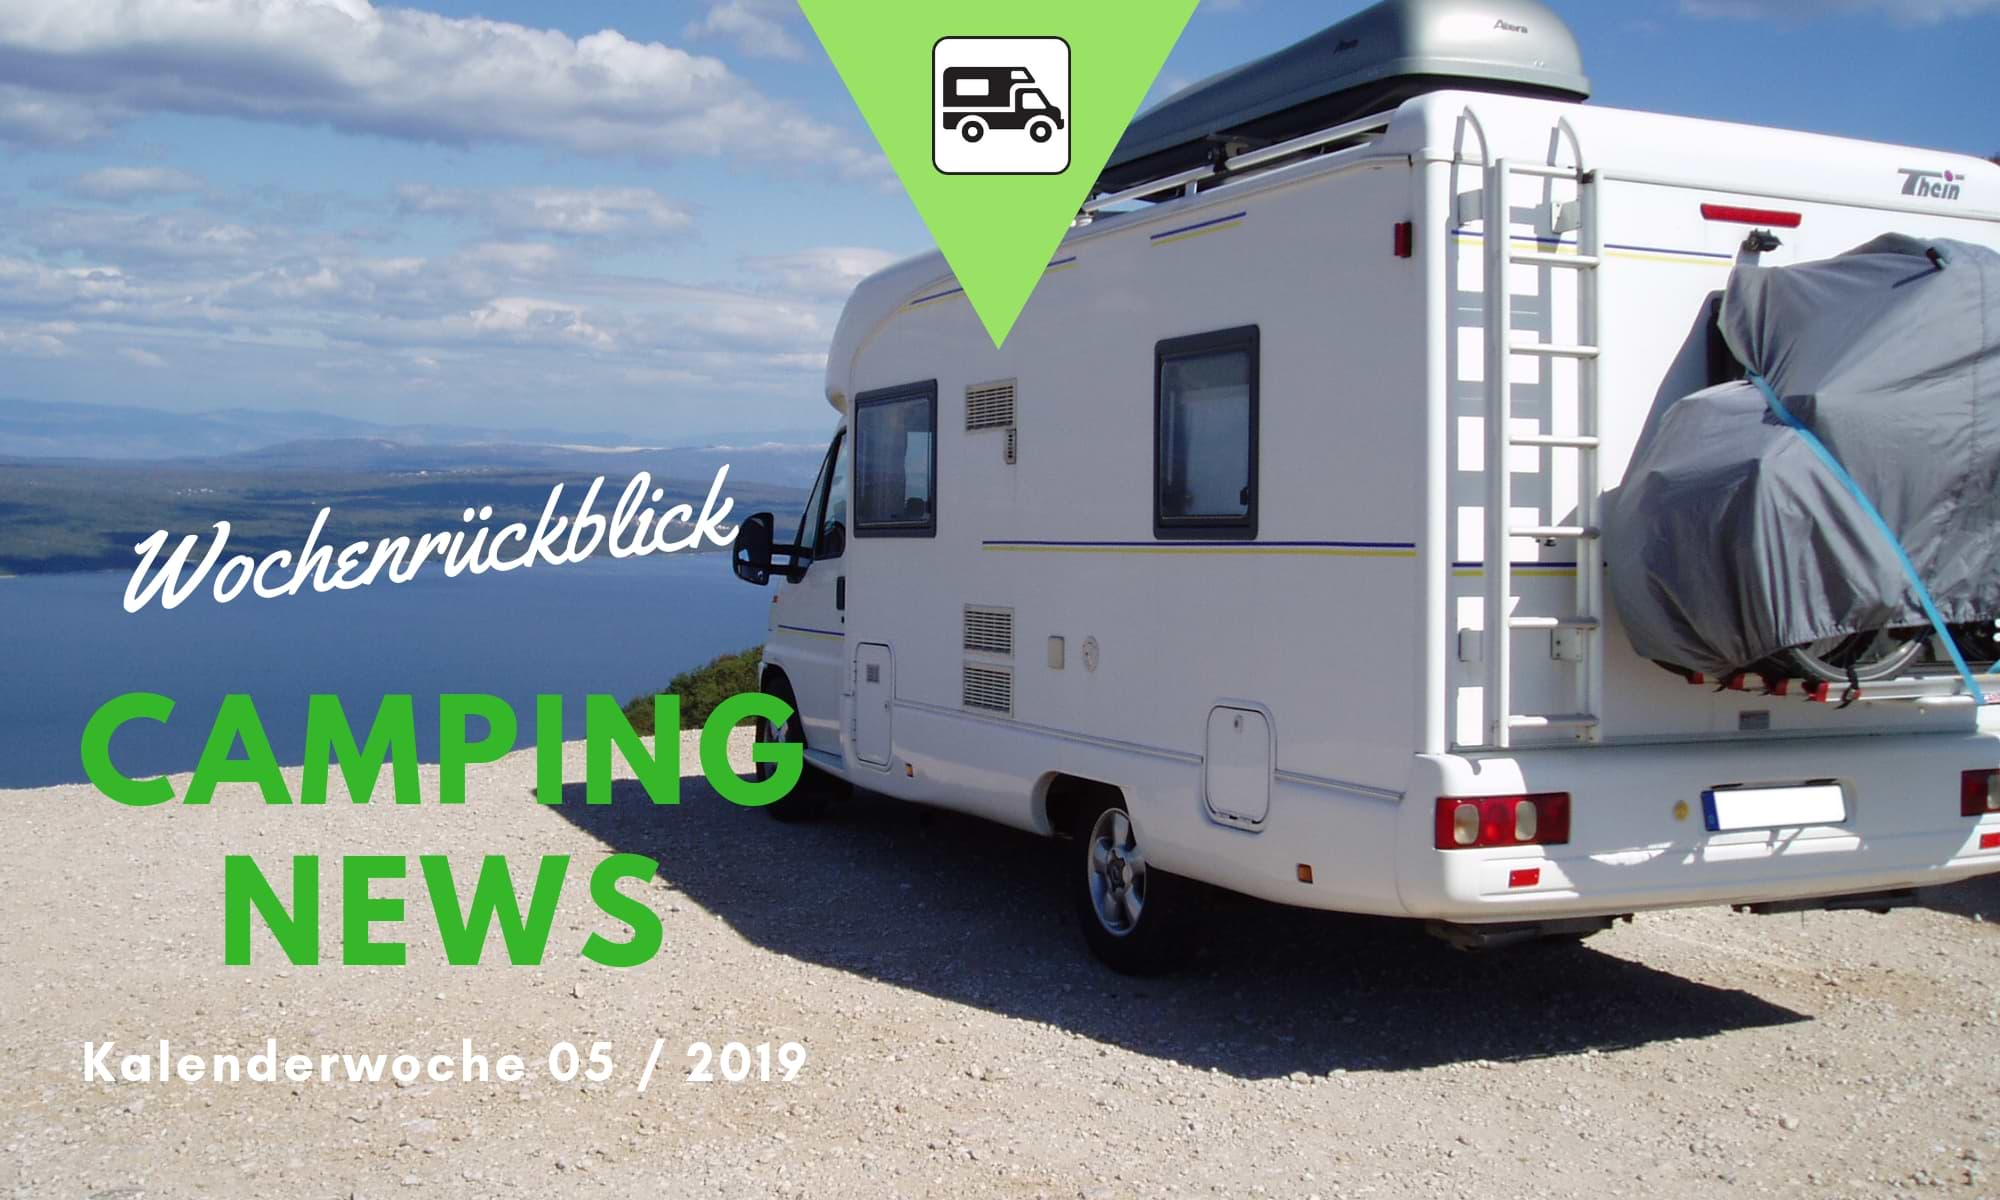 Wochenrückblick Camping News KW05-2019